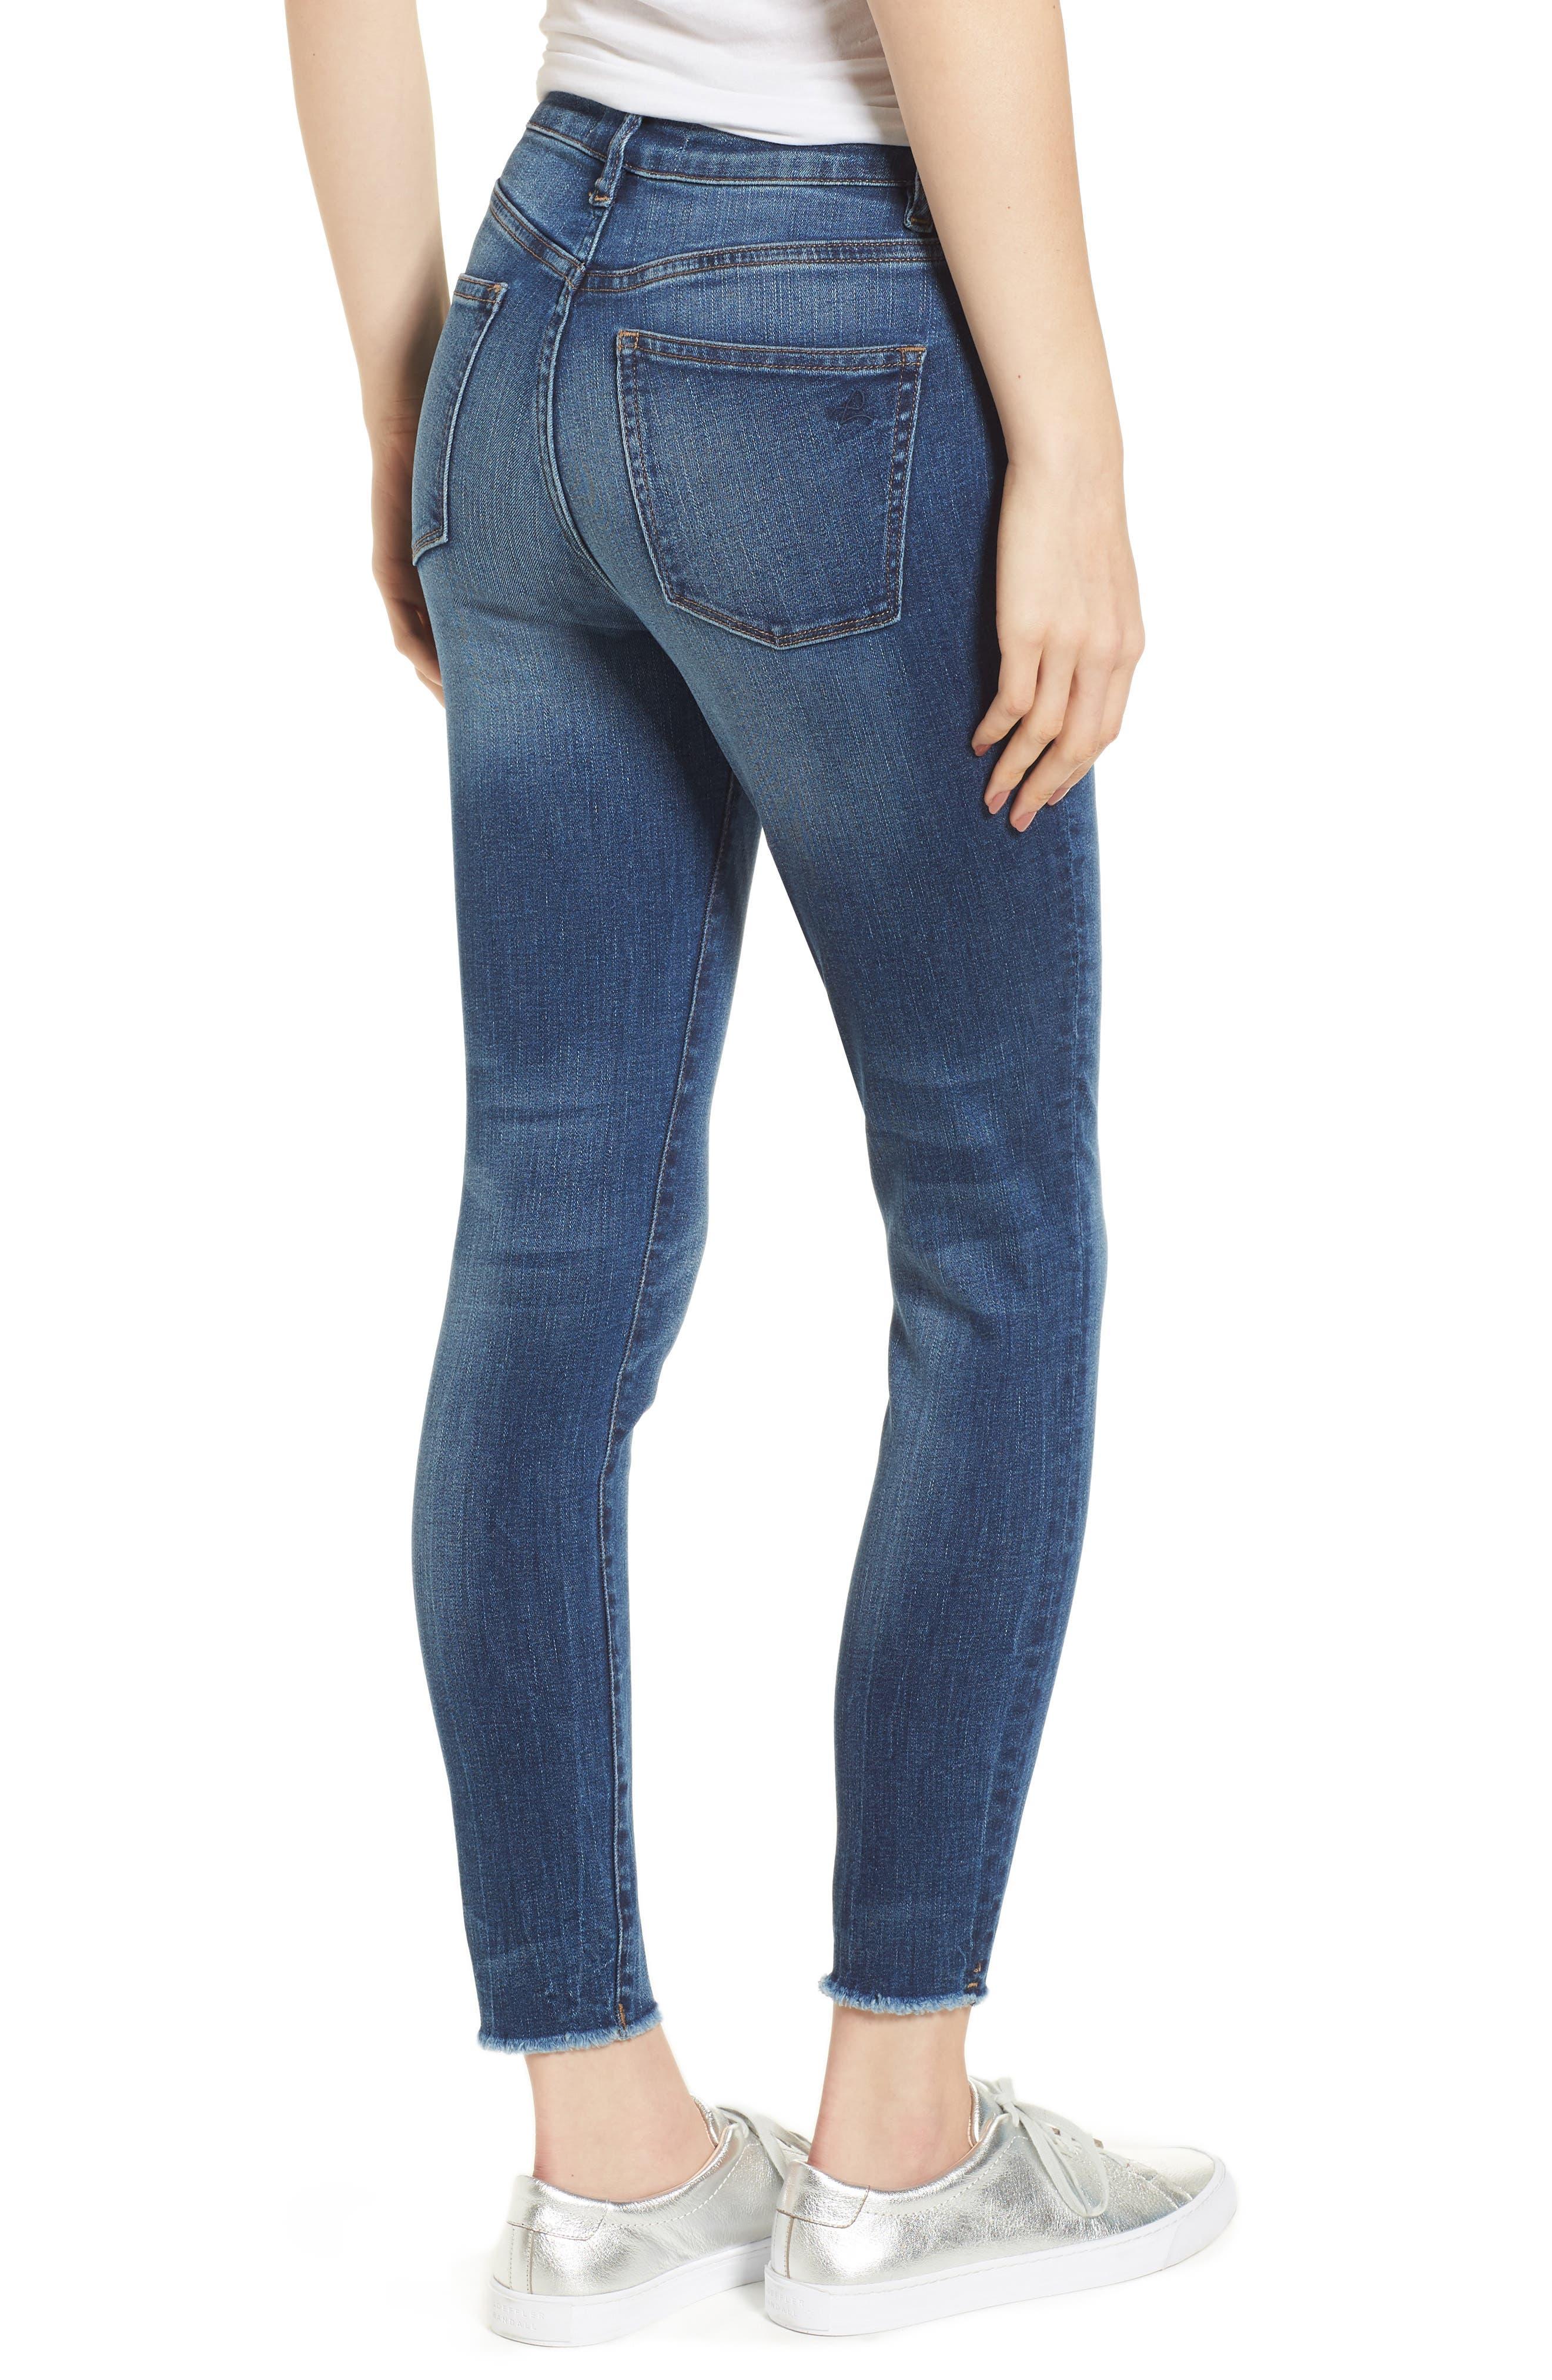 Chrissy Trimtone High Waist Skinny Jeans,                             Alternate thumbnail 2, color,                             Bal Harbour